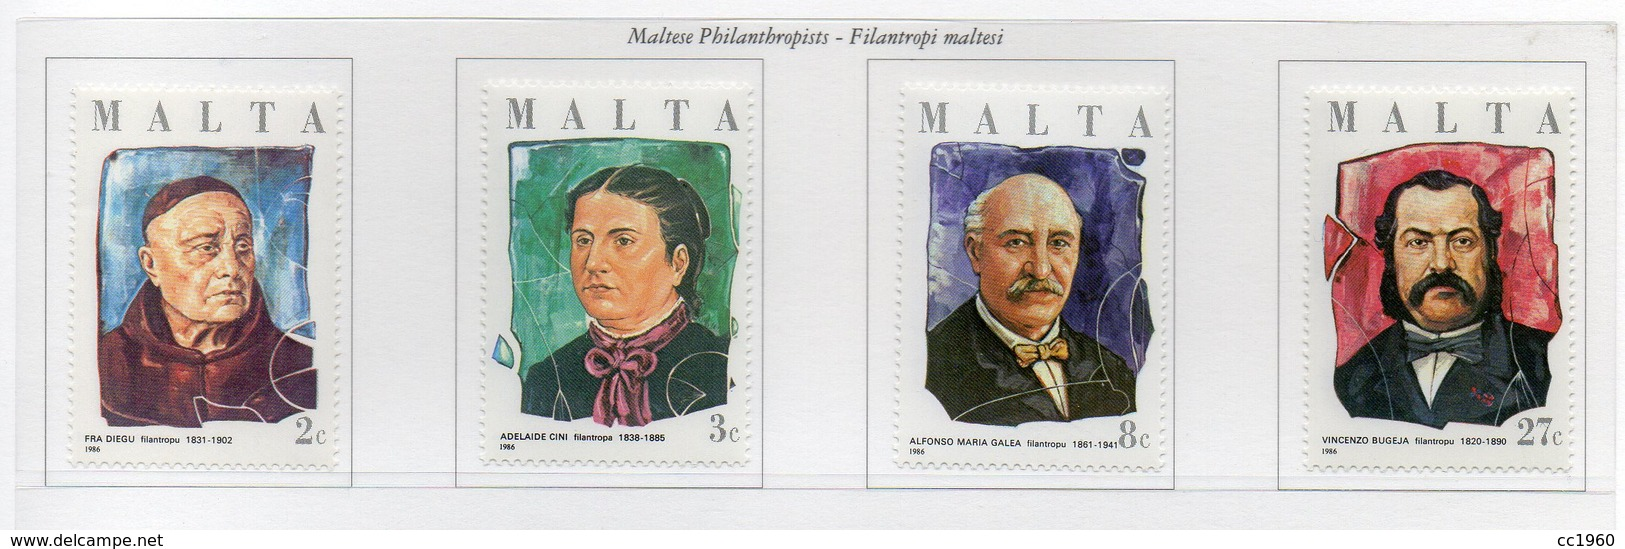 Malta - 1986 - Filantropi Maltesi - 4 Valori - Nuovi - Vedi Foto - (FDC14119) - Malta